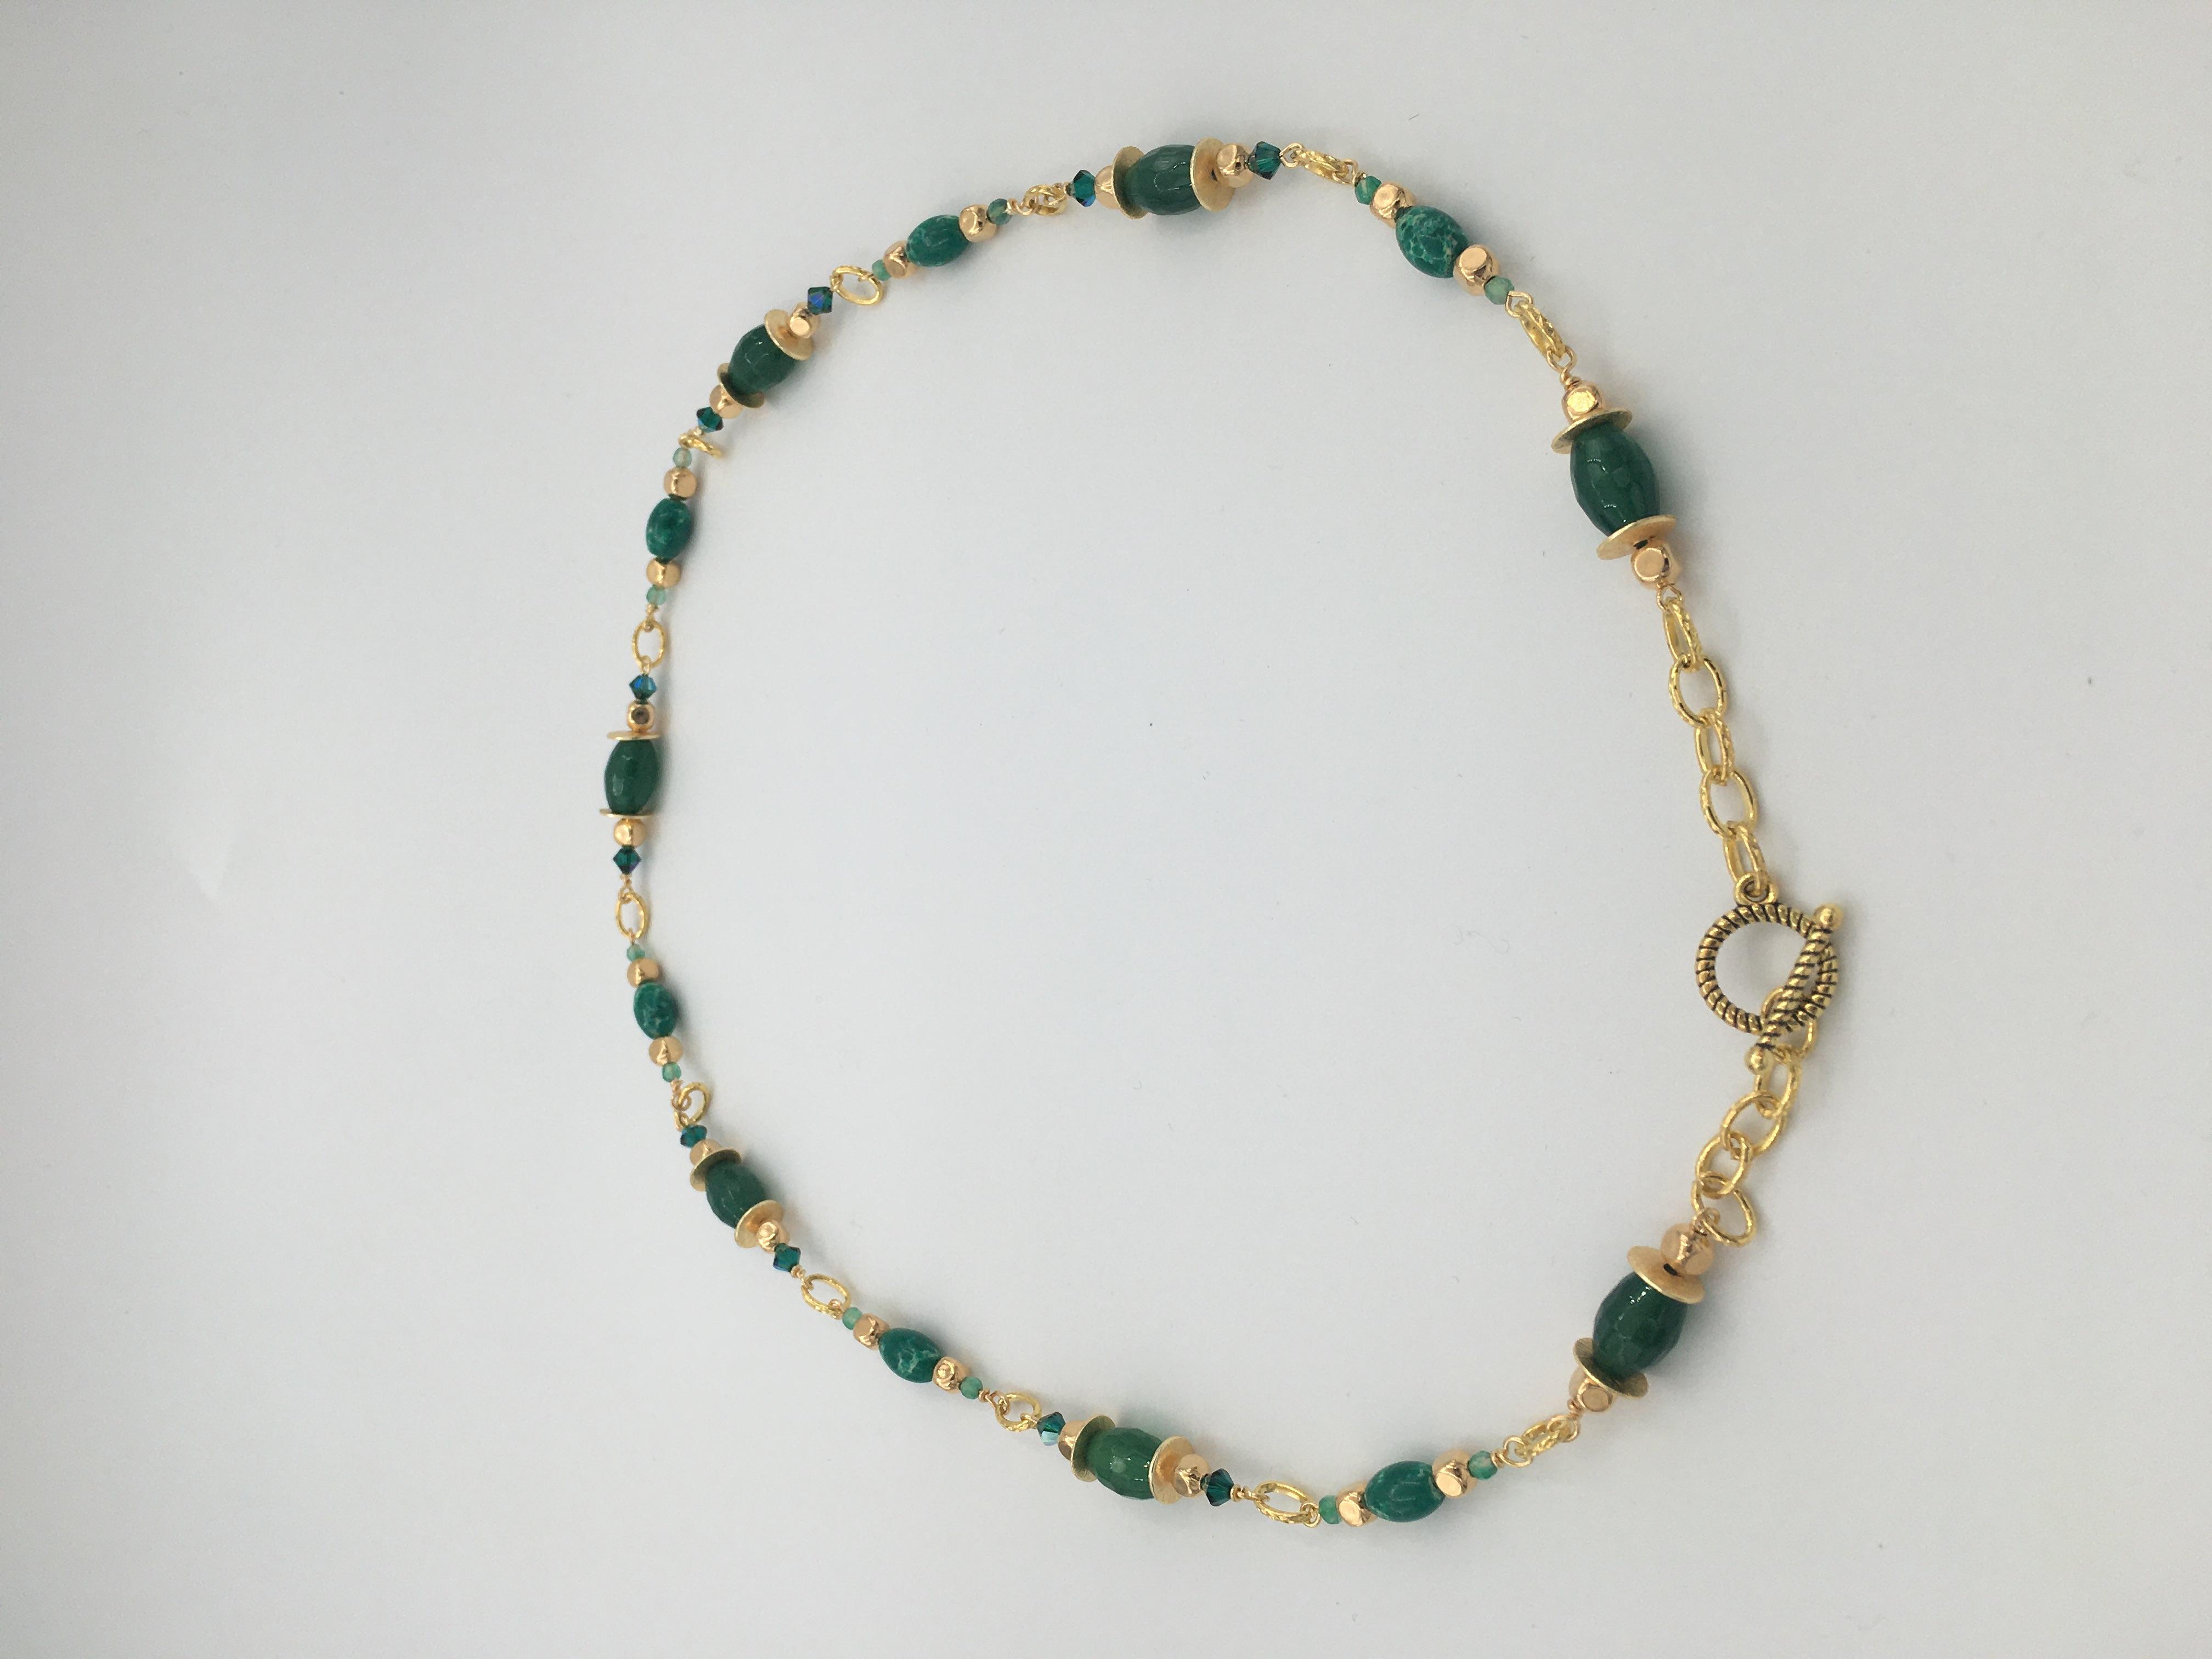 Agate Swarovski Crystals - Necklace Image